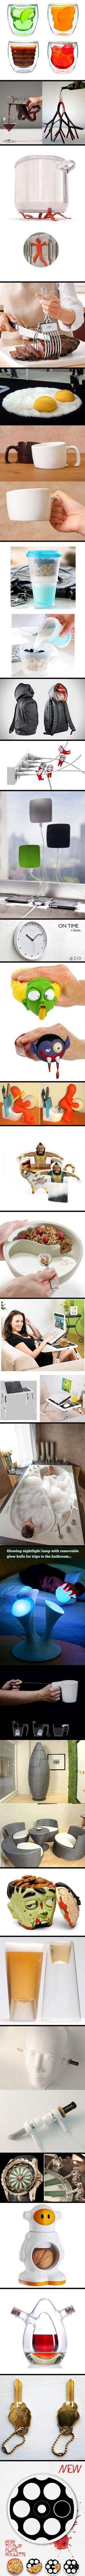 24 Cool and Creative Home Gadgets That Think Outside the Box - lovin' the Mr.T bag, tea mug, & sword ear buds.